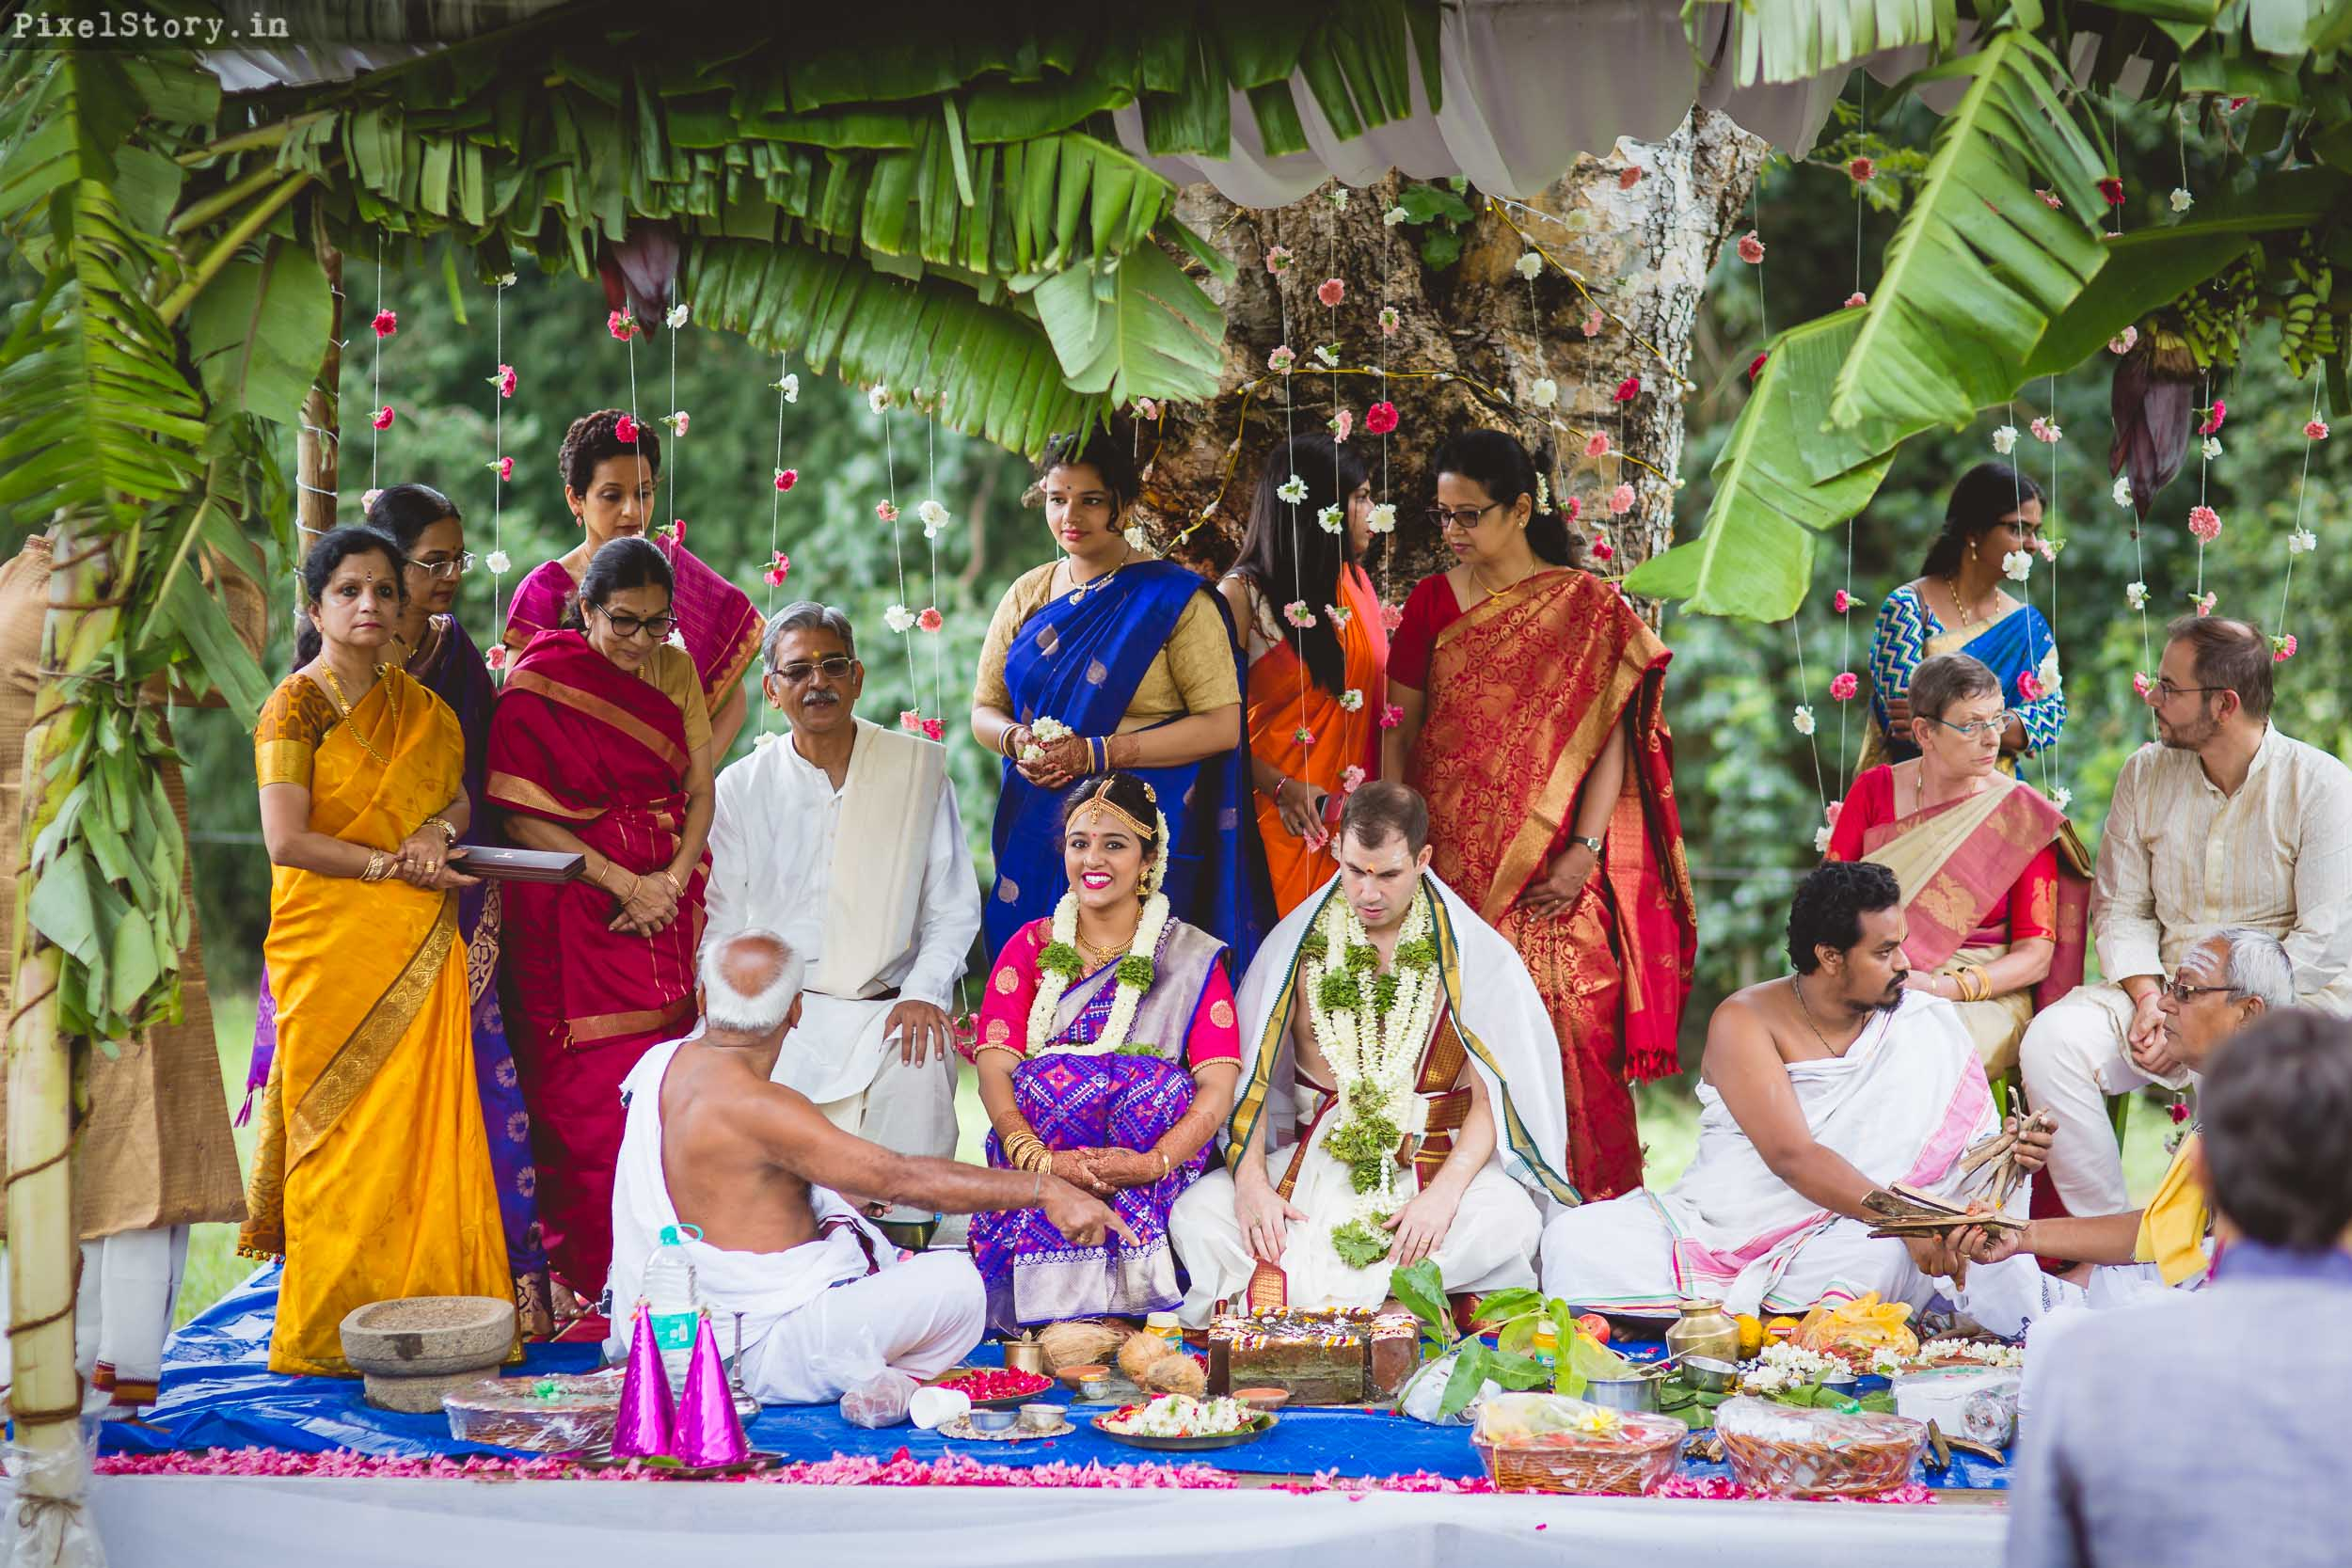 PixelStory-Jungle-Wedding-Photographer-Masinagudi-Indo-French057.jpg